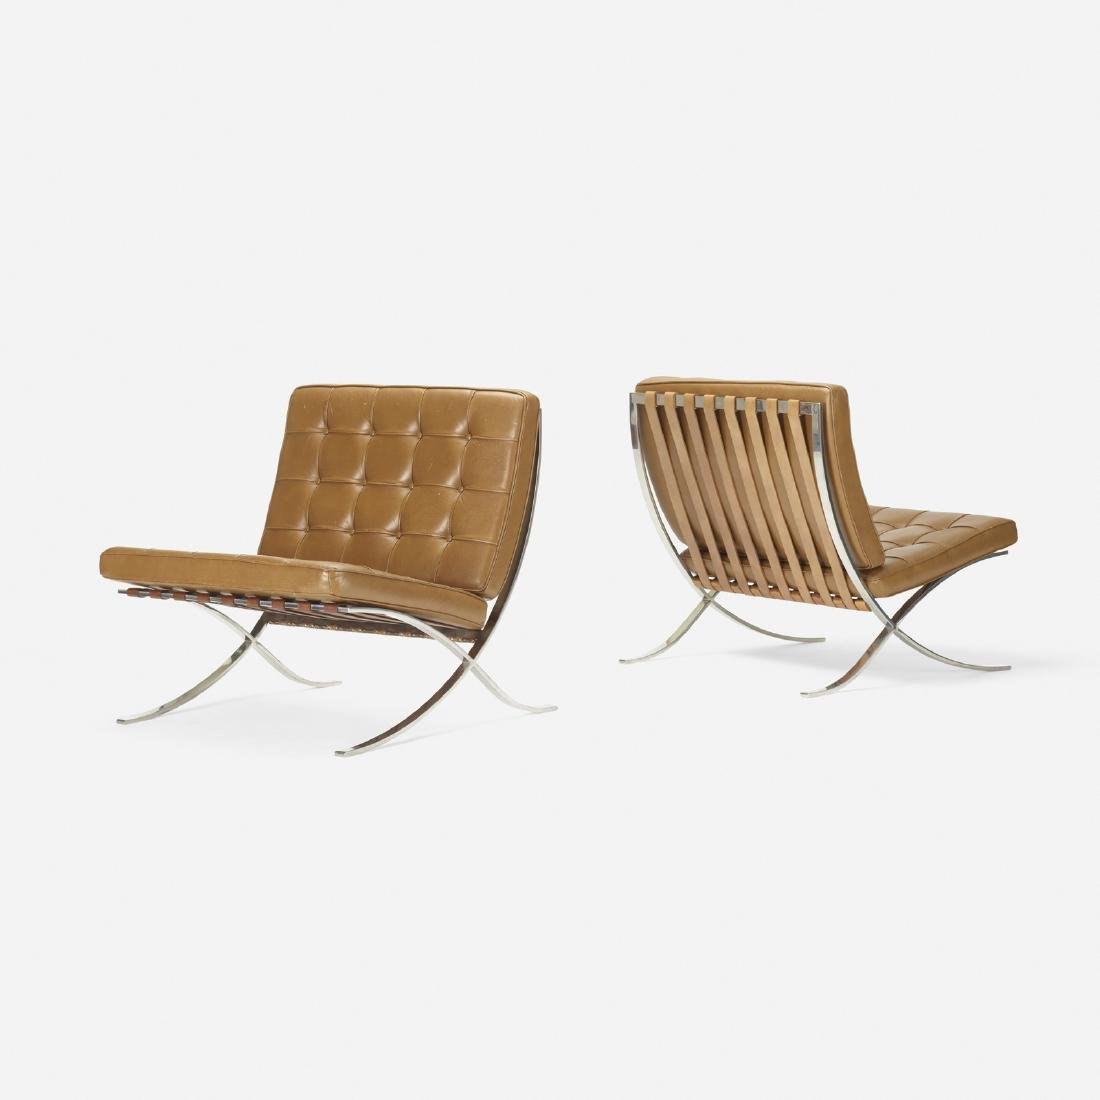 Ludwig Mies van der Rohe, Barcelona chairs, pair - 2